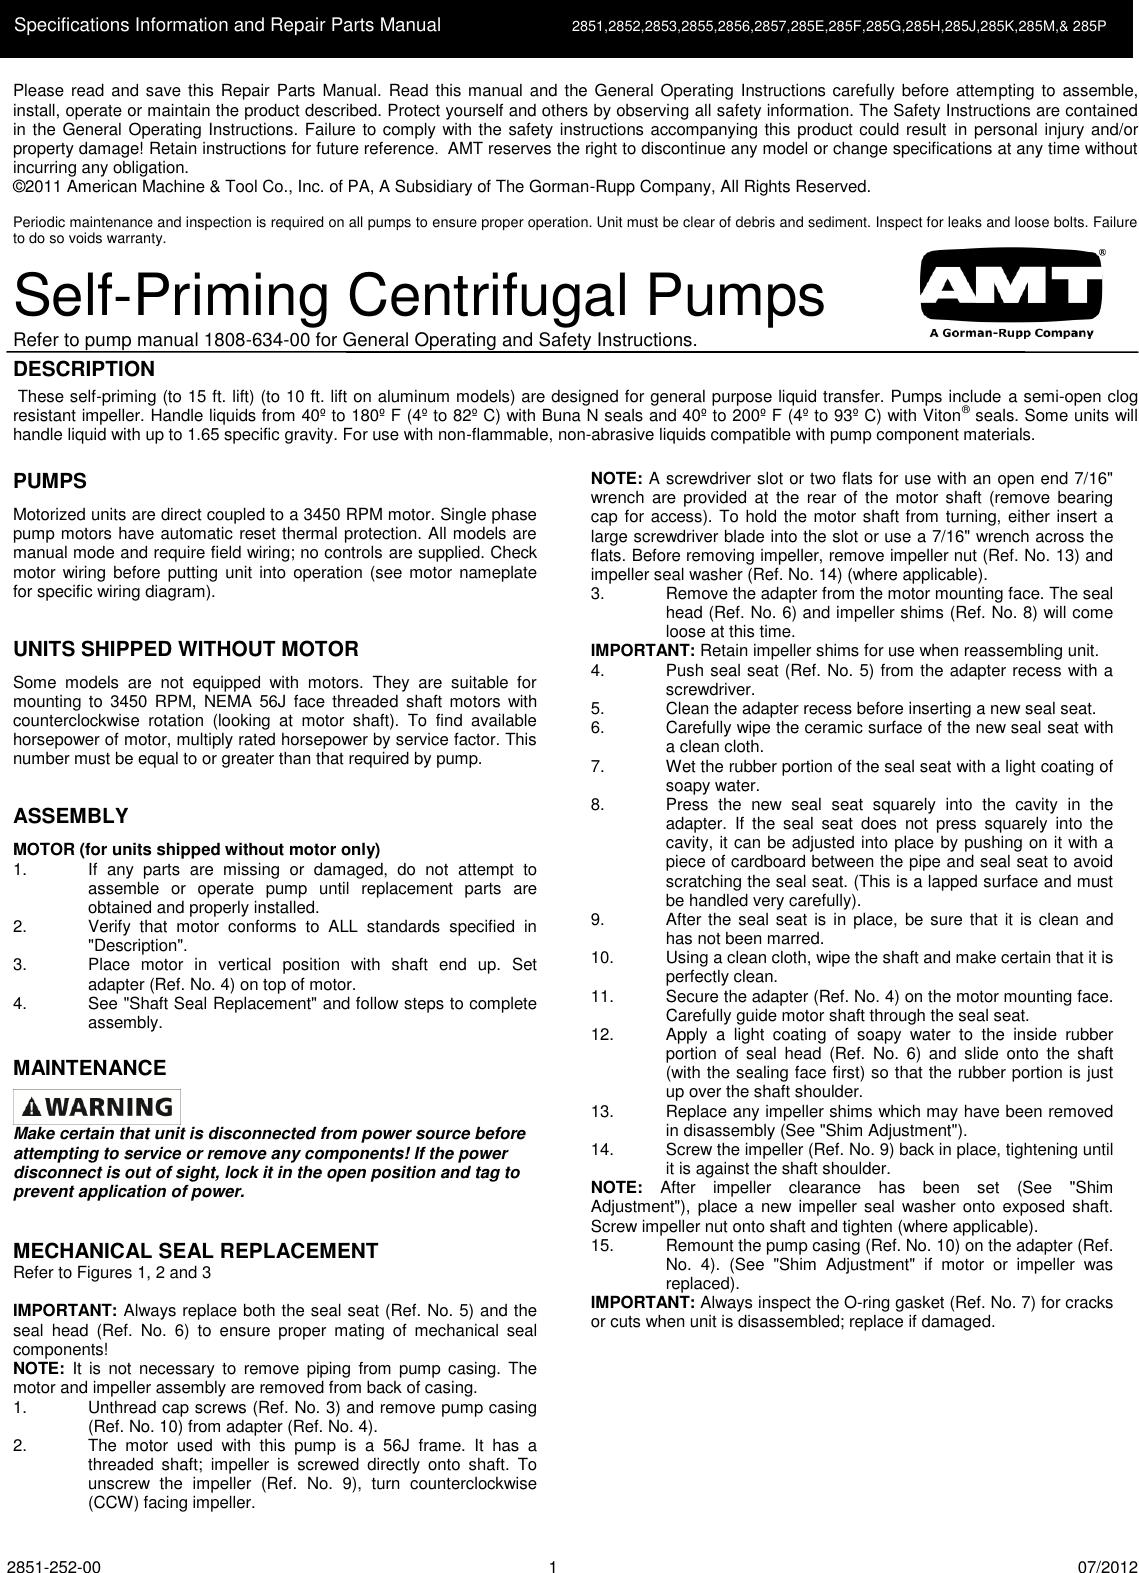 537184 3 Amt Cast Iron Centrifugal Pump Repair Parts User Manual Thermal Protector Wiring Diagram